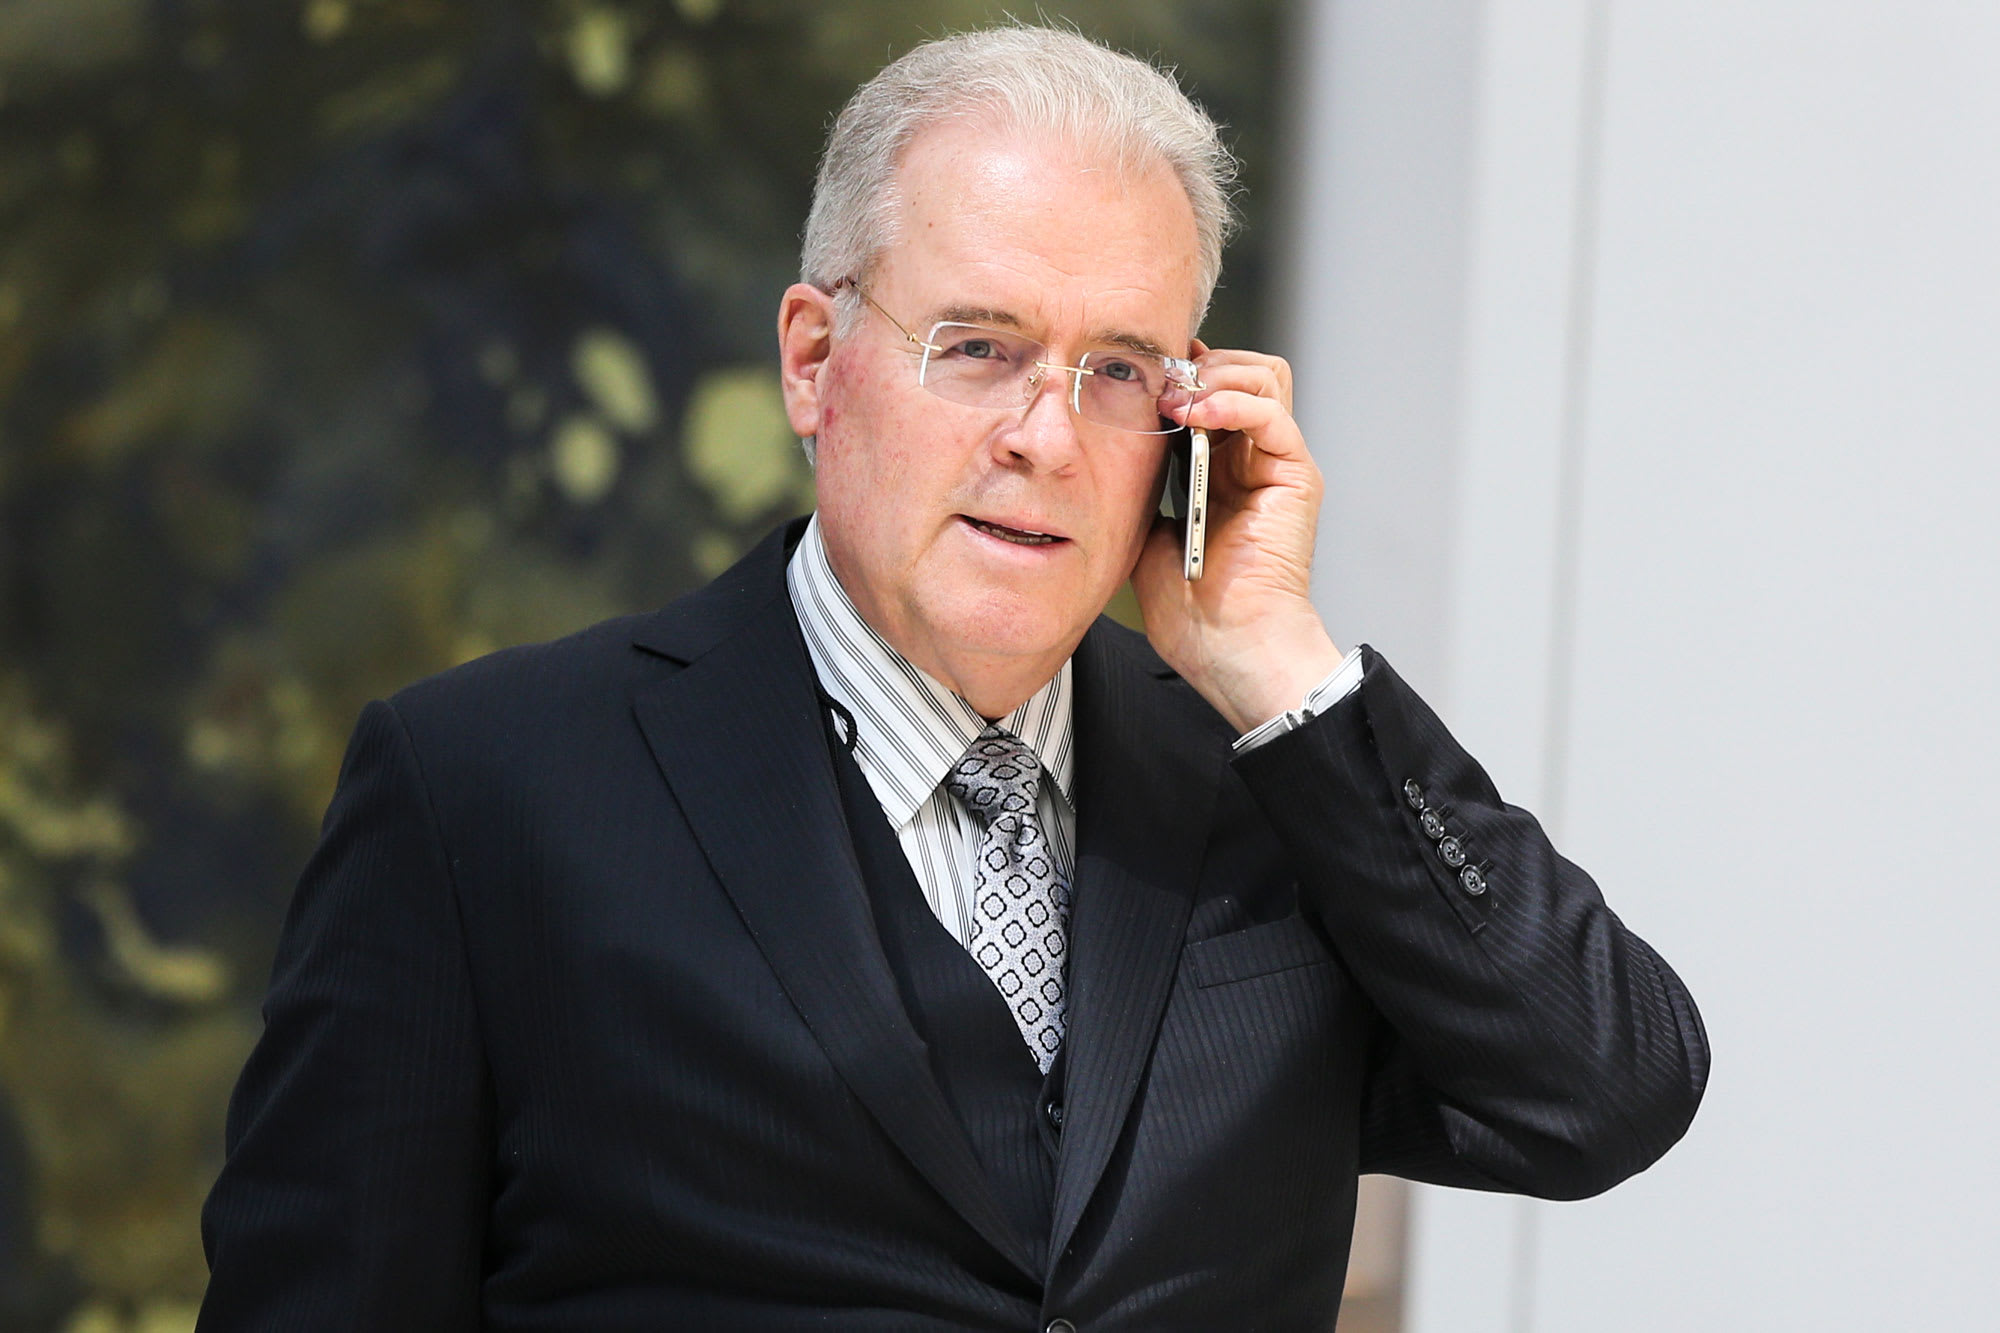 Robert Mercer starts big money effort for Trump and RNC after cutting back support